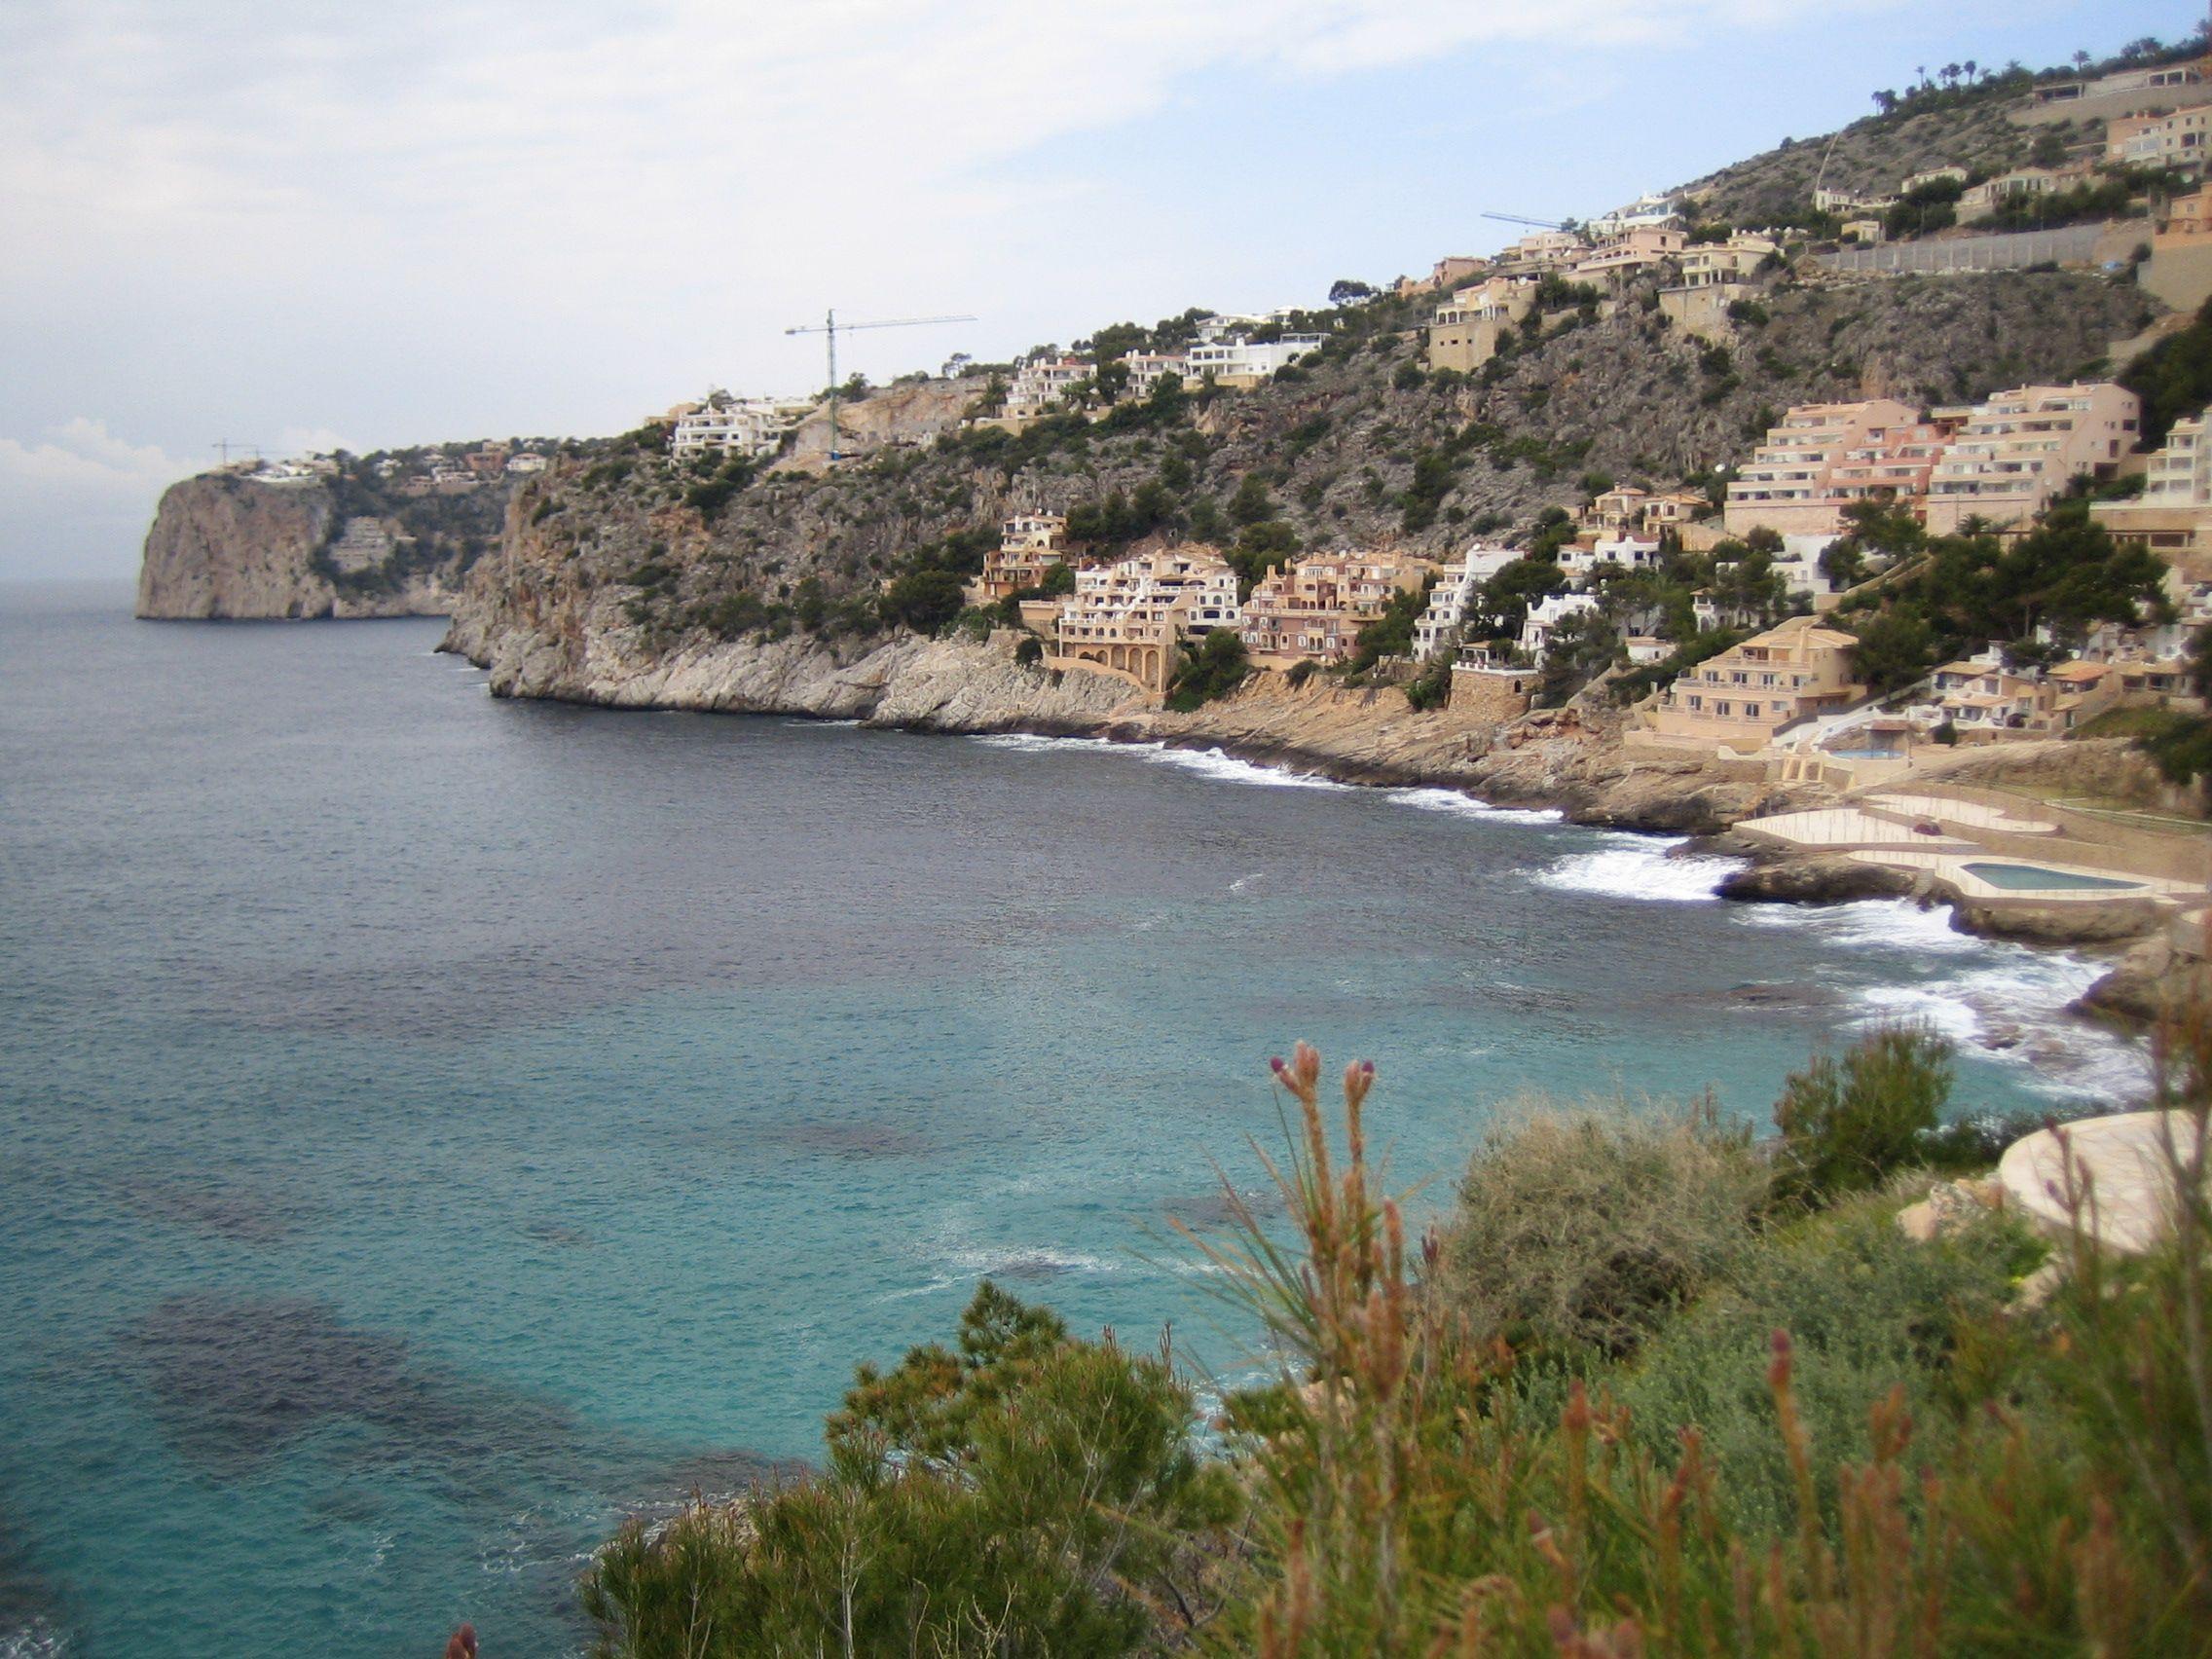 Playa Cala Llamp